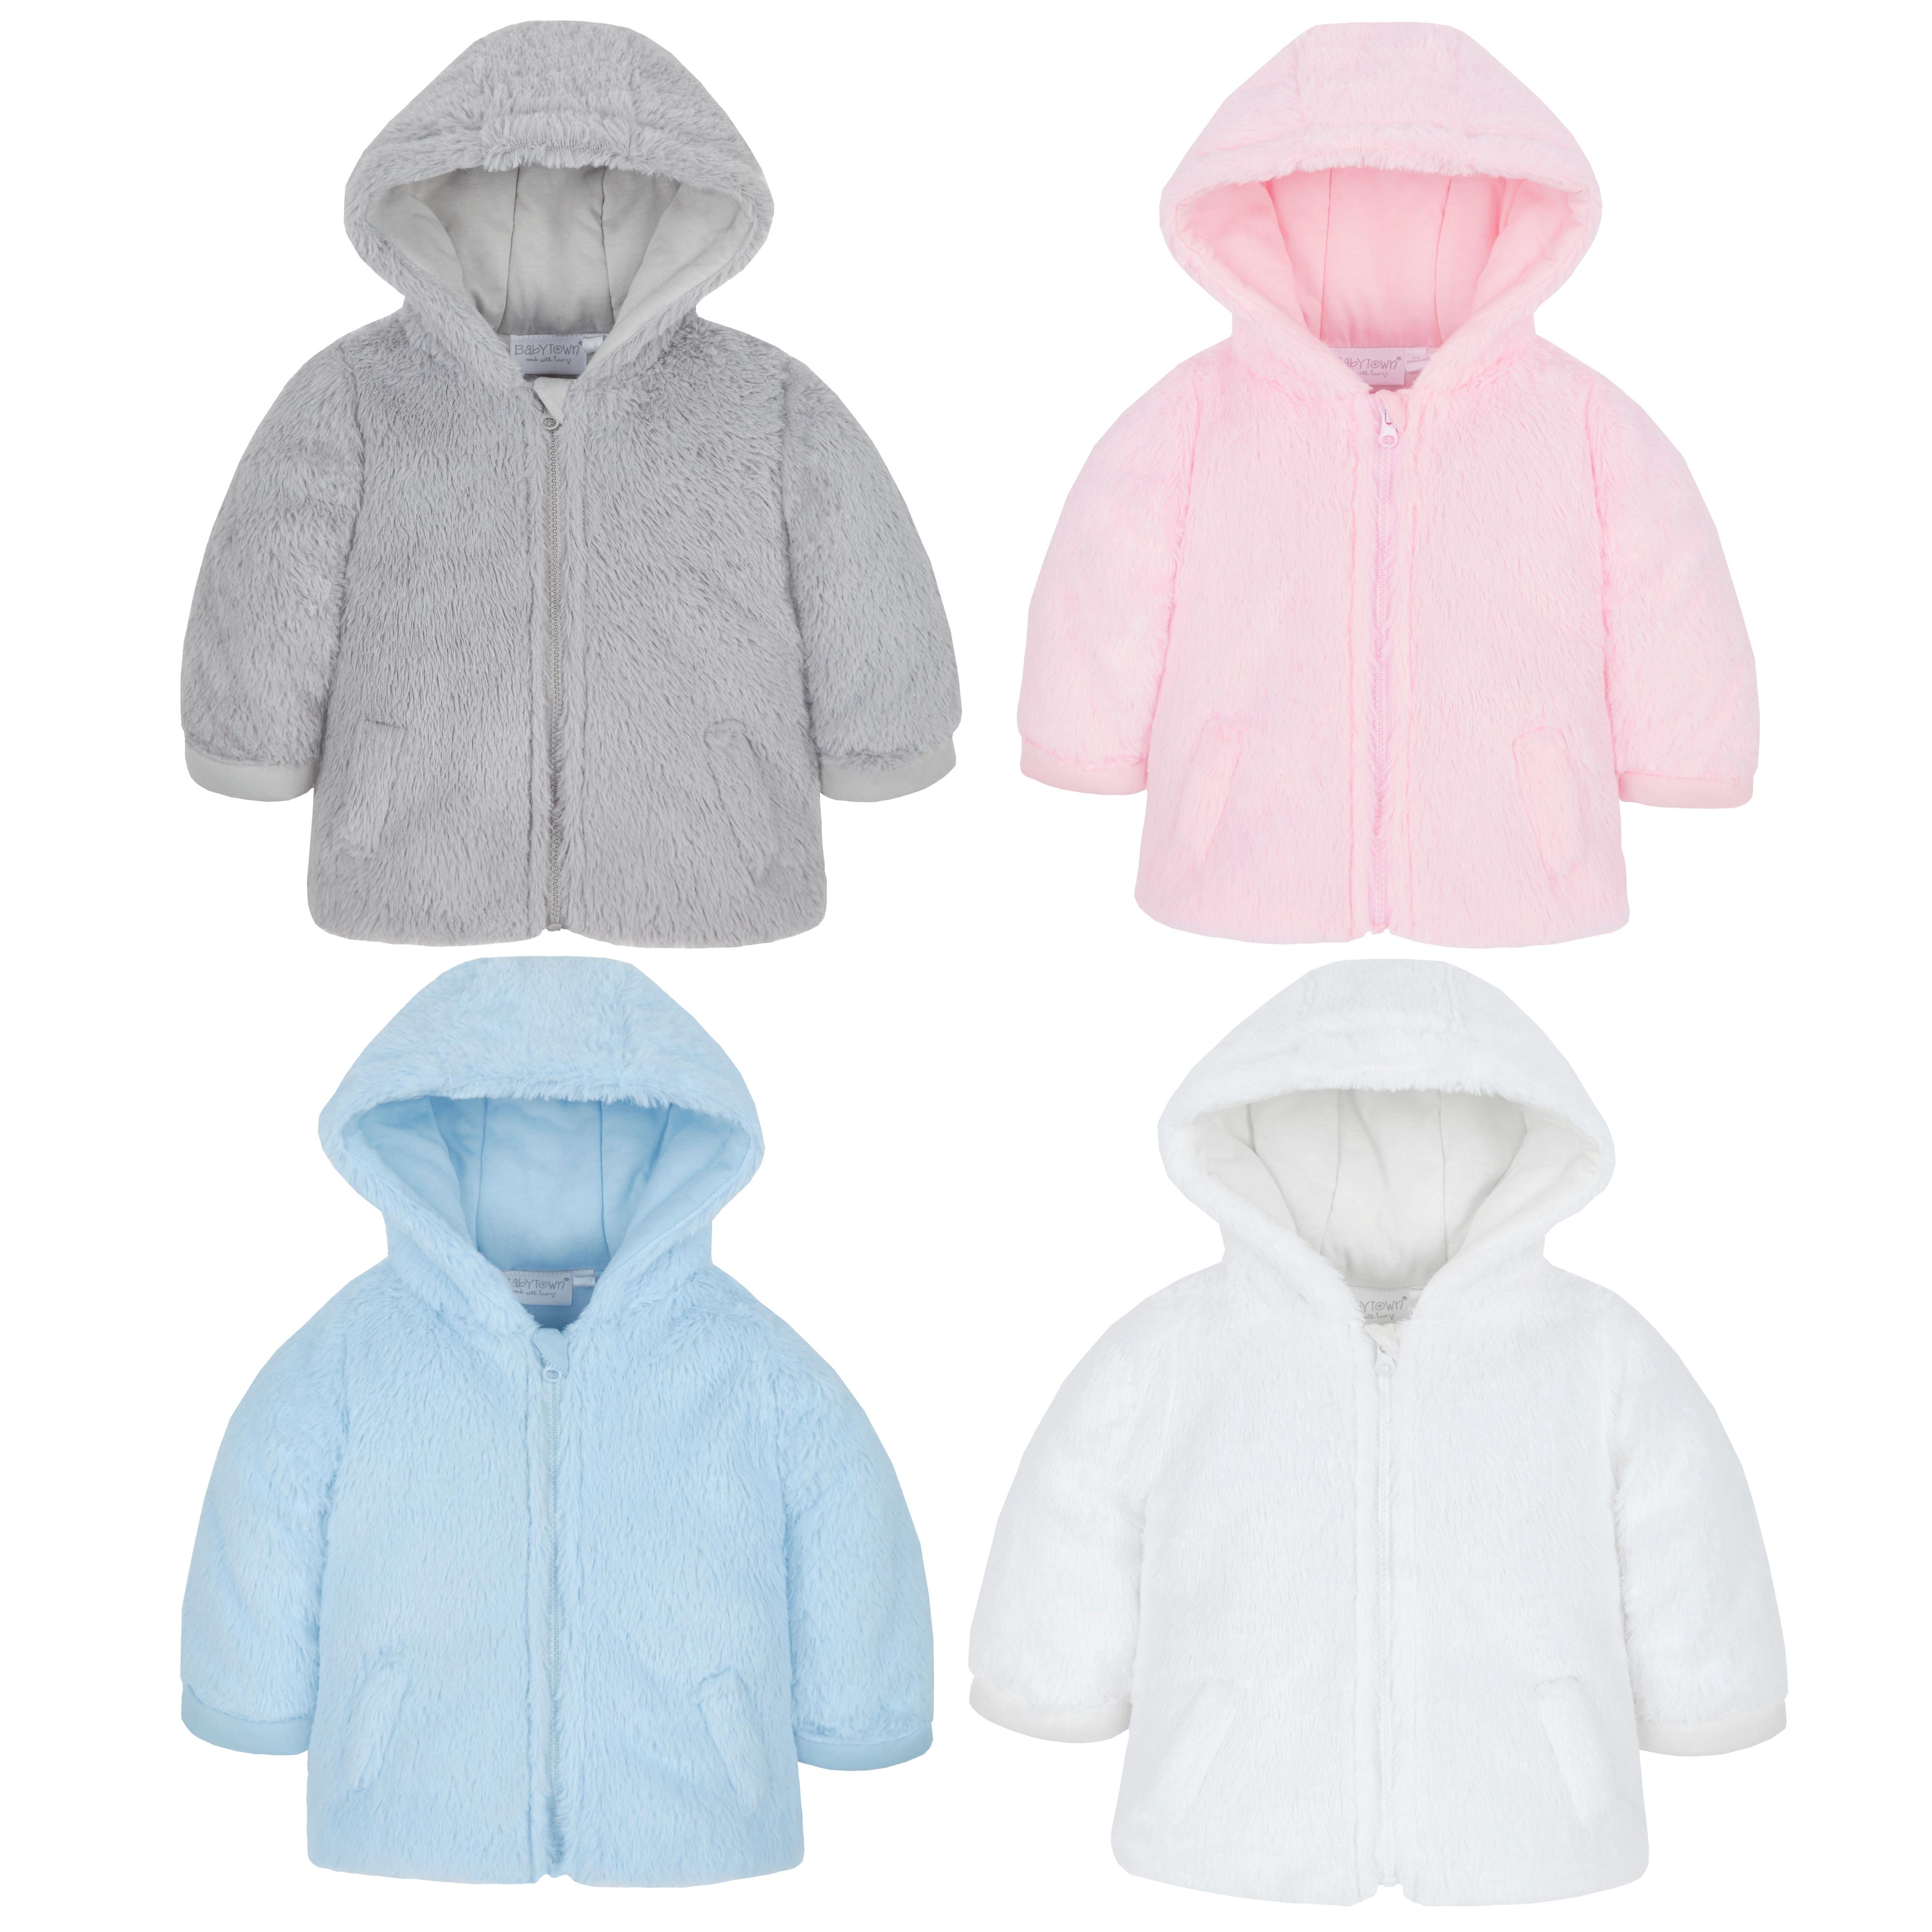 b22f8a9bb Baby Unisex Coat Jacket Newborn Fluffy Hood Zip Up Warm Puffer Girls ...